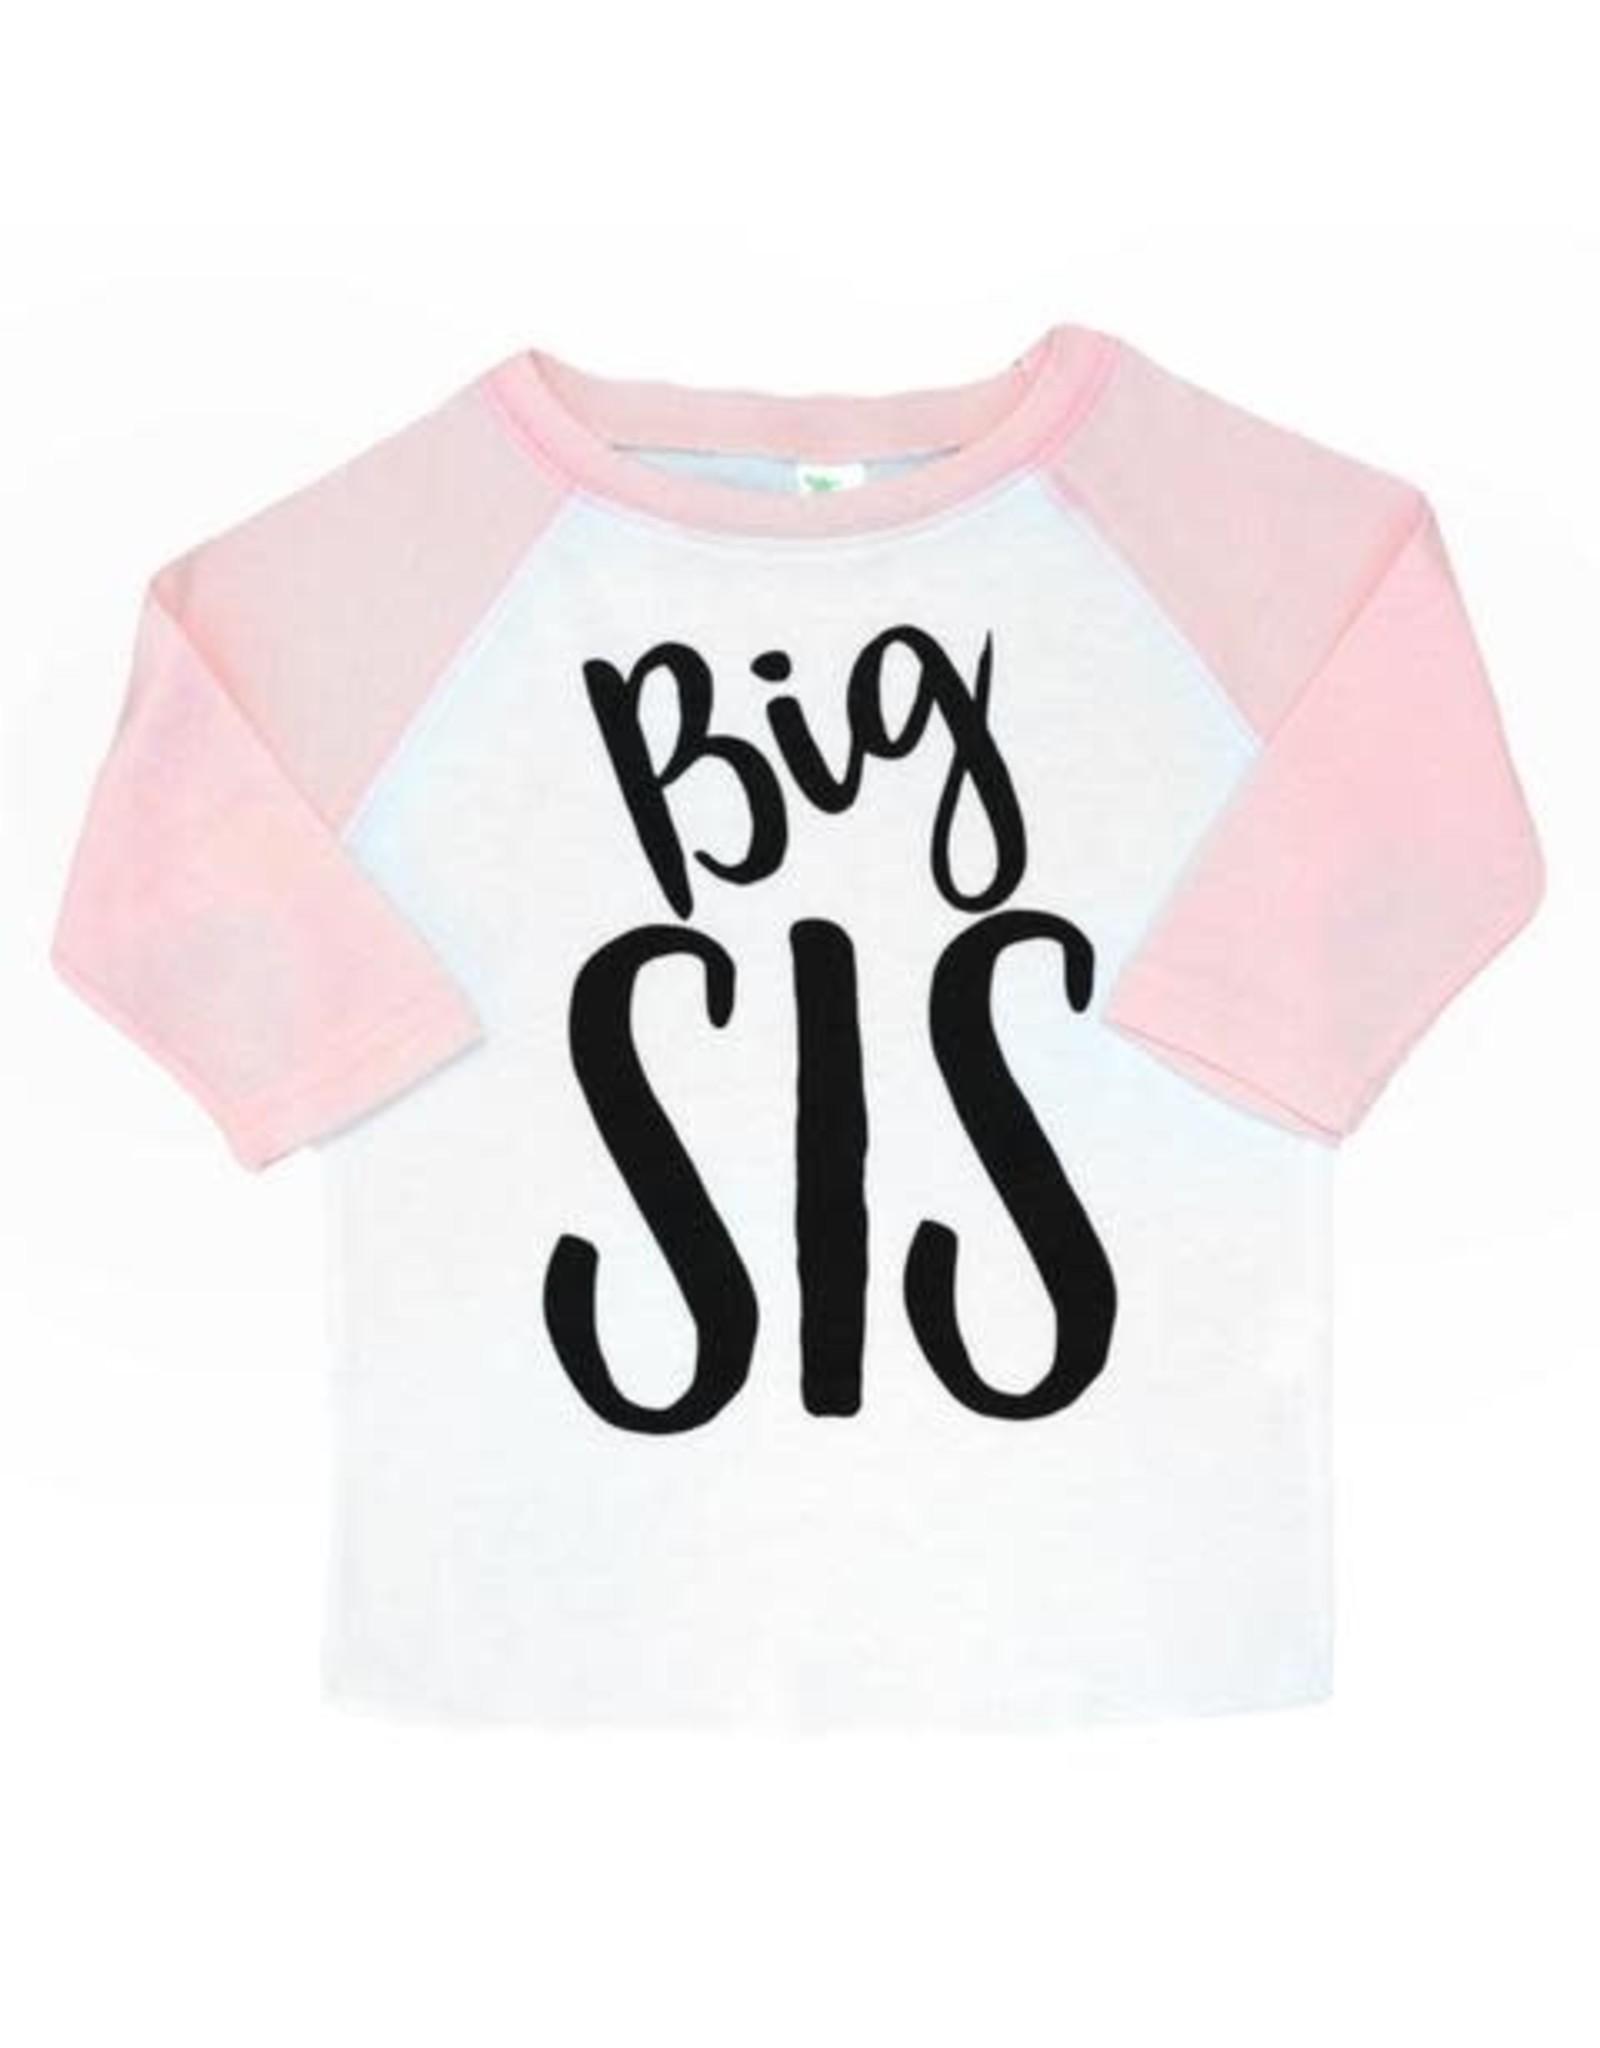 Gigi & Max Gigi & Max - Big Sis Pink Sleeve Raglan